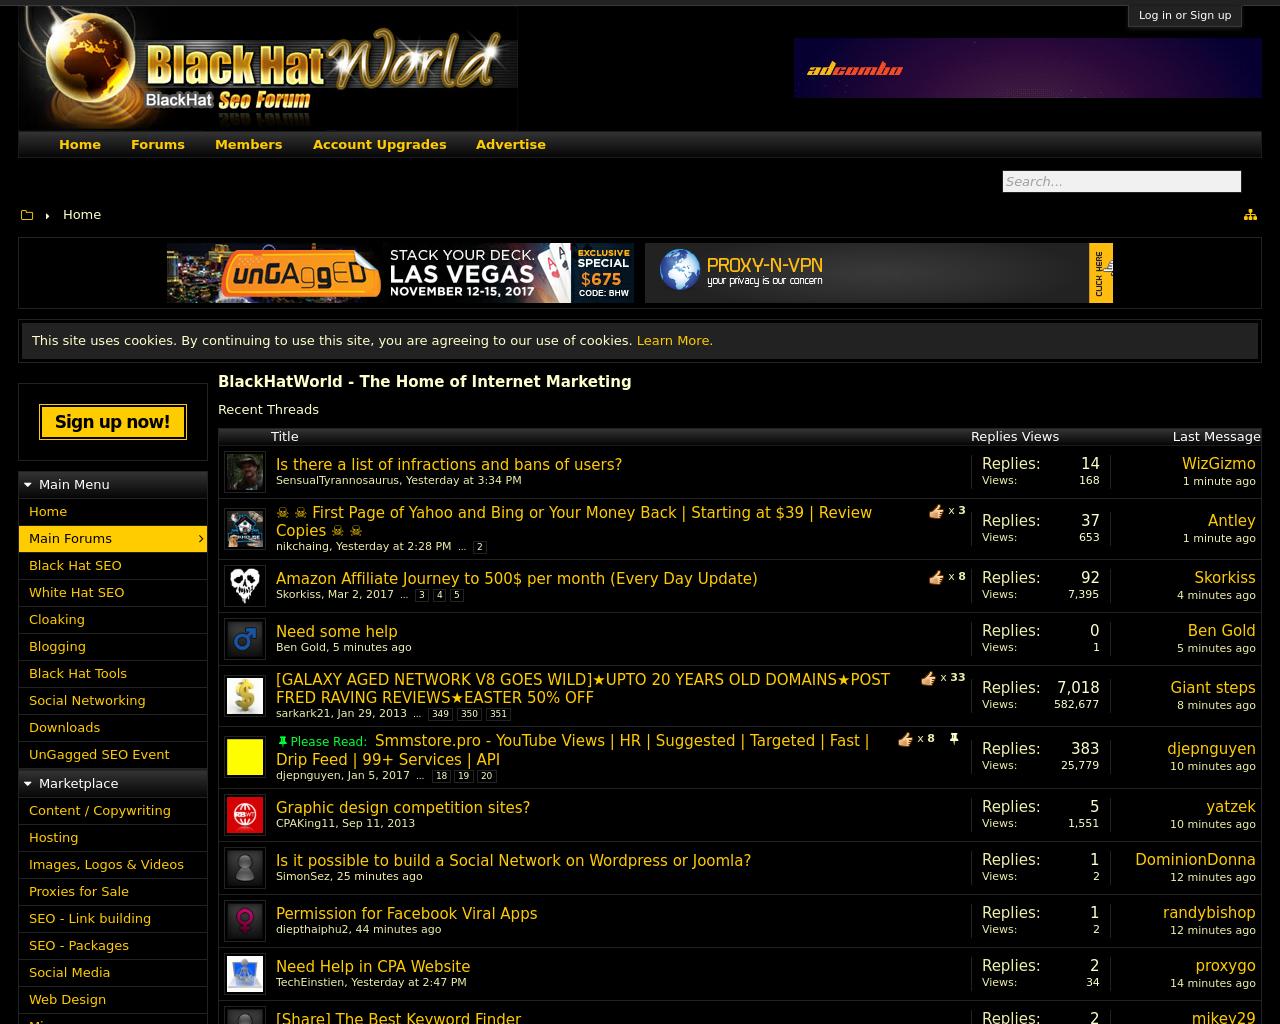 Black-Hat-World-Advertising-Reviews-Pricing